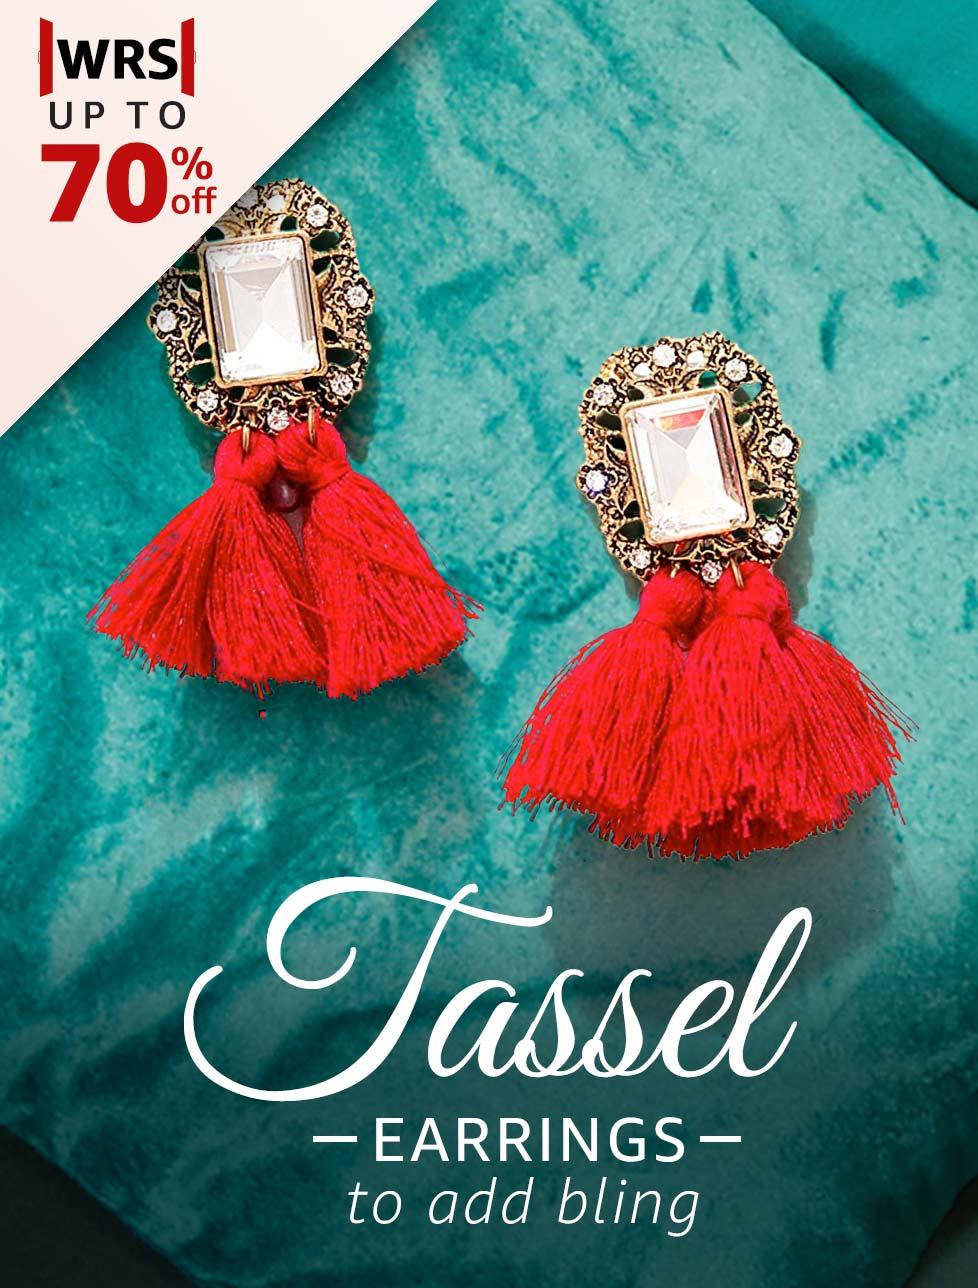 Tasseled Earrings to add bling